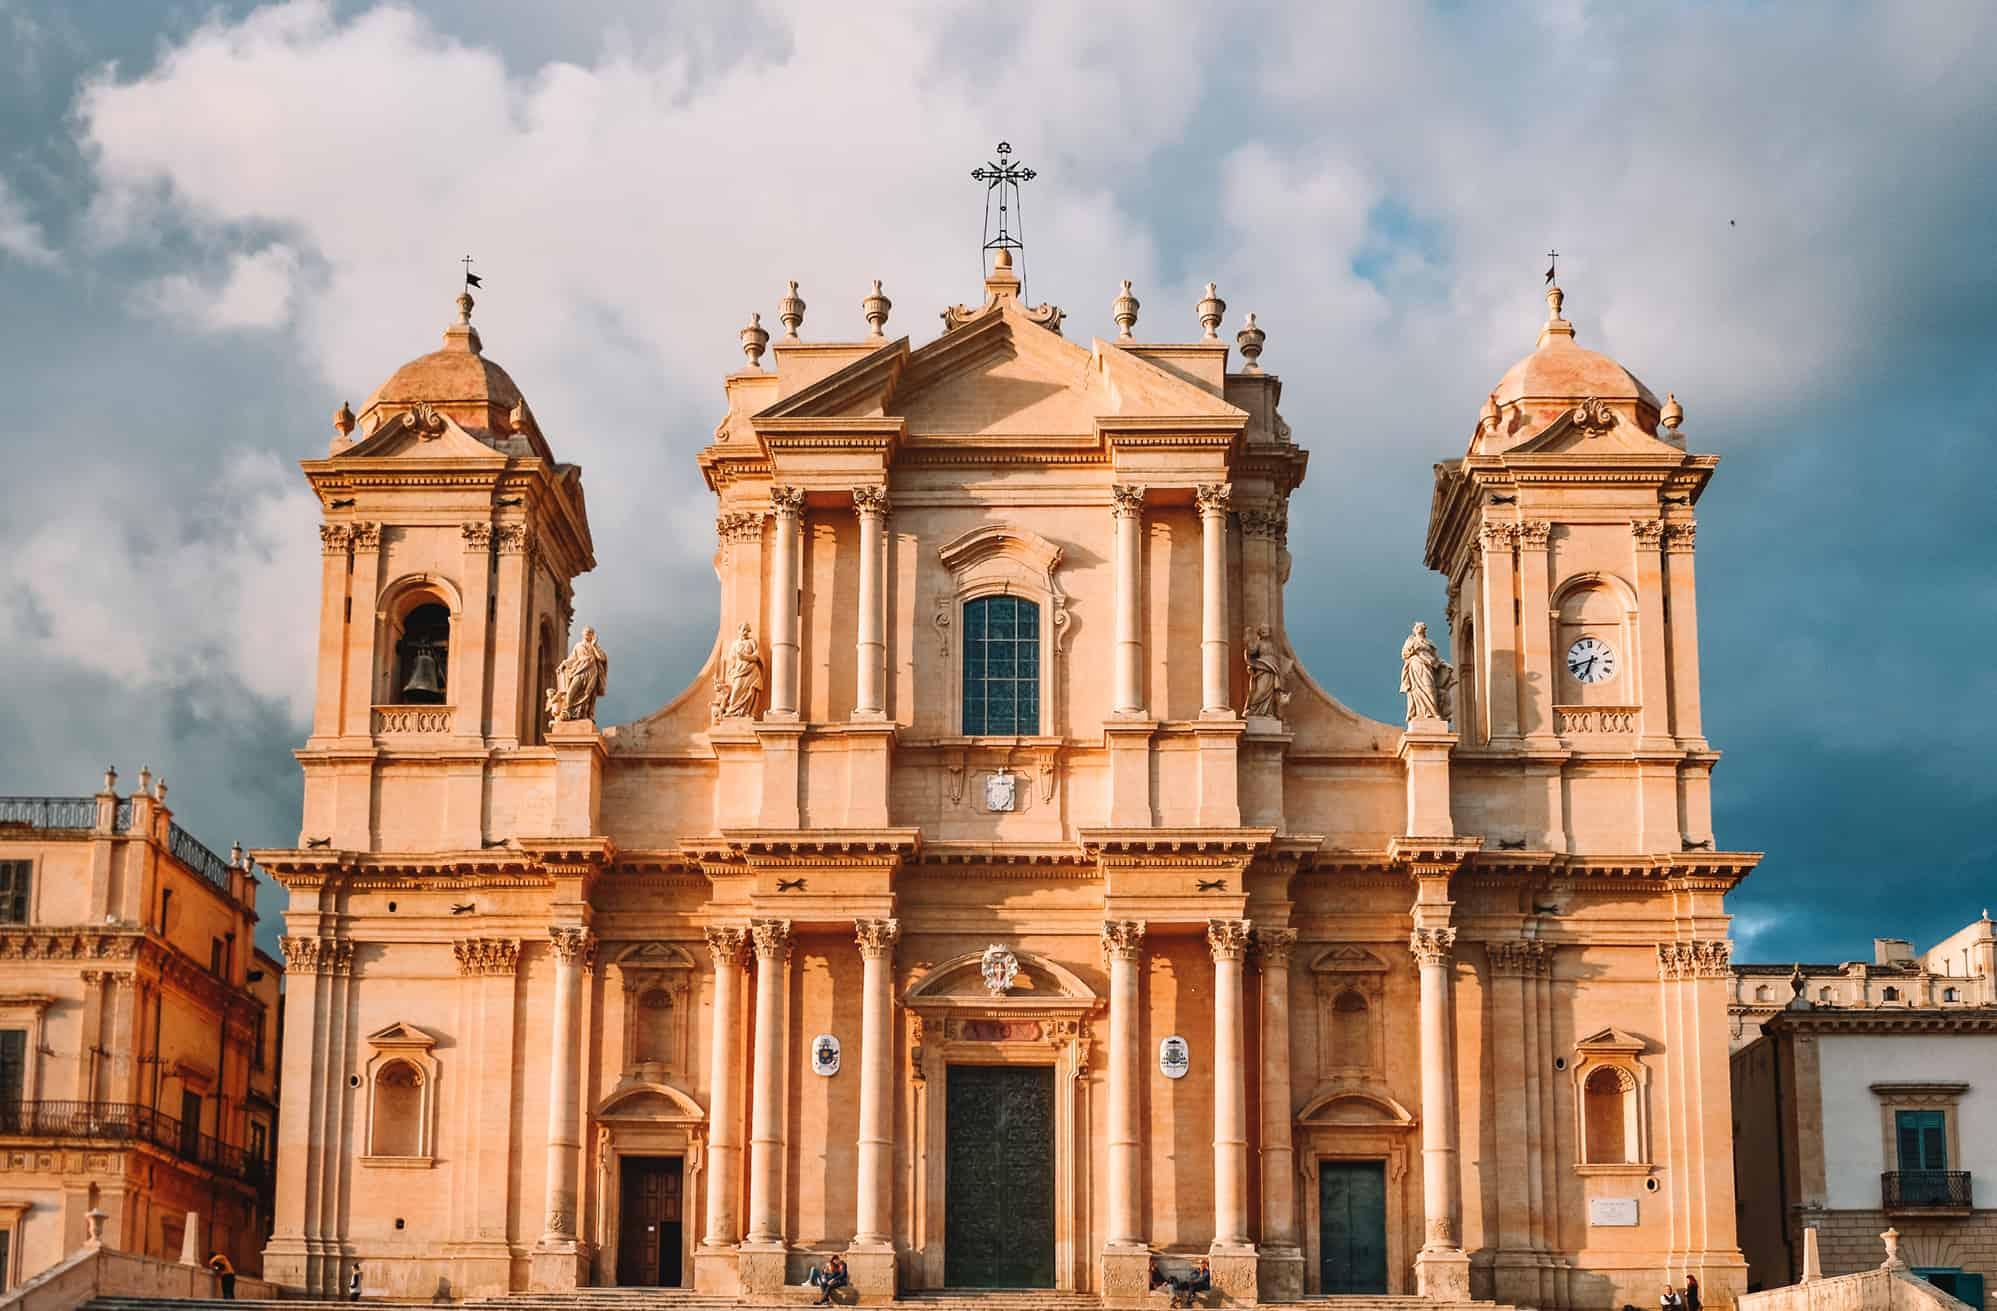 Breathtaking venue for your destination Italian wedding in Sicily